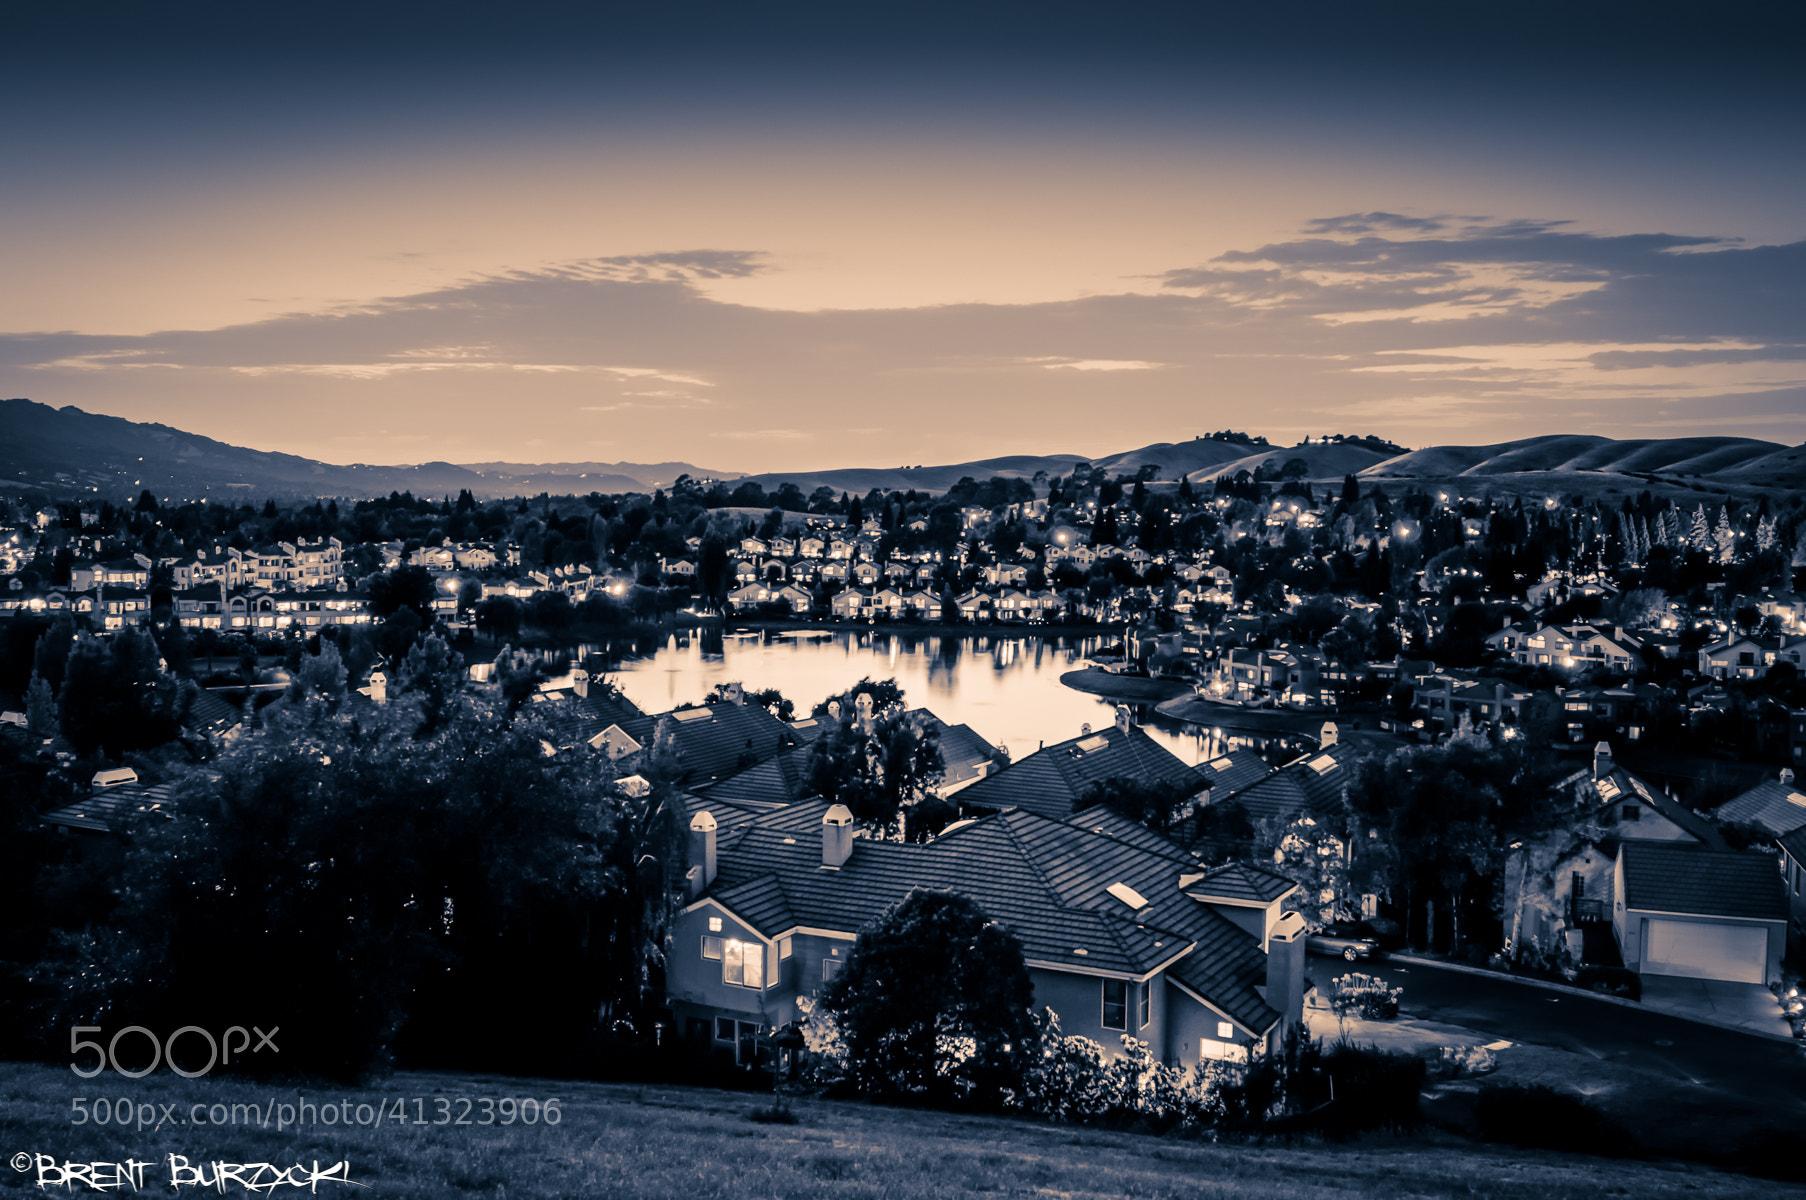 Photograph The Neighborhood..... by Brent Burzycki on 500px